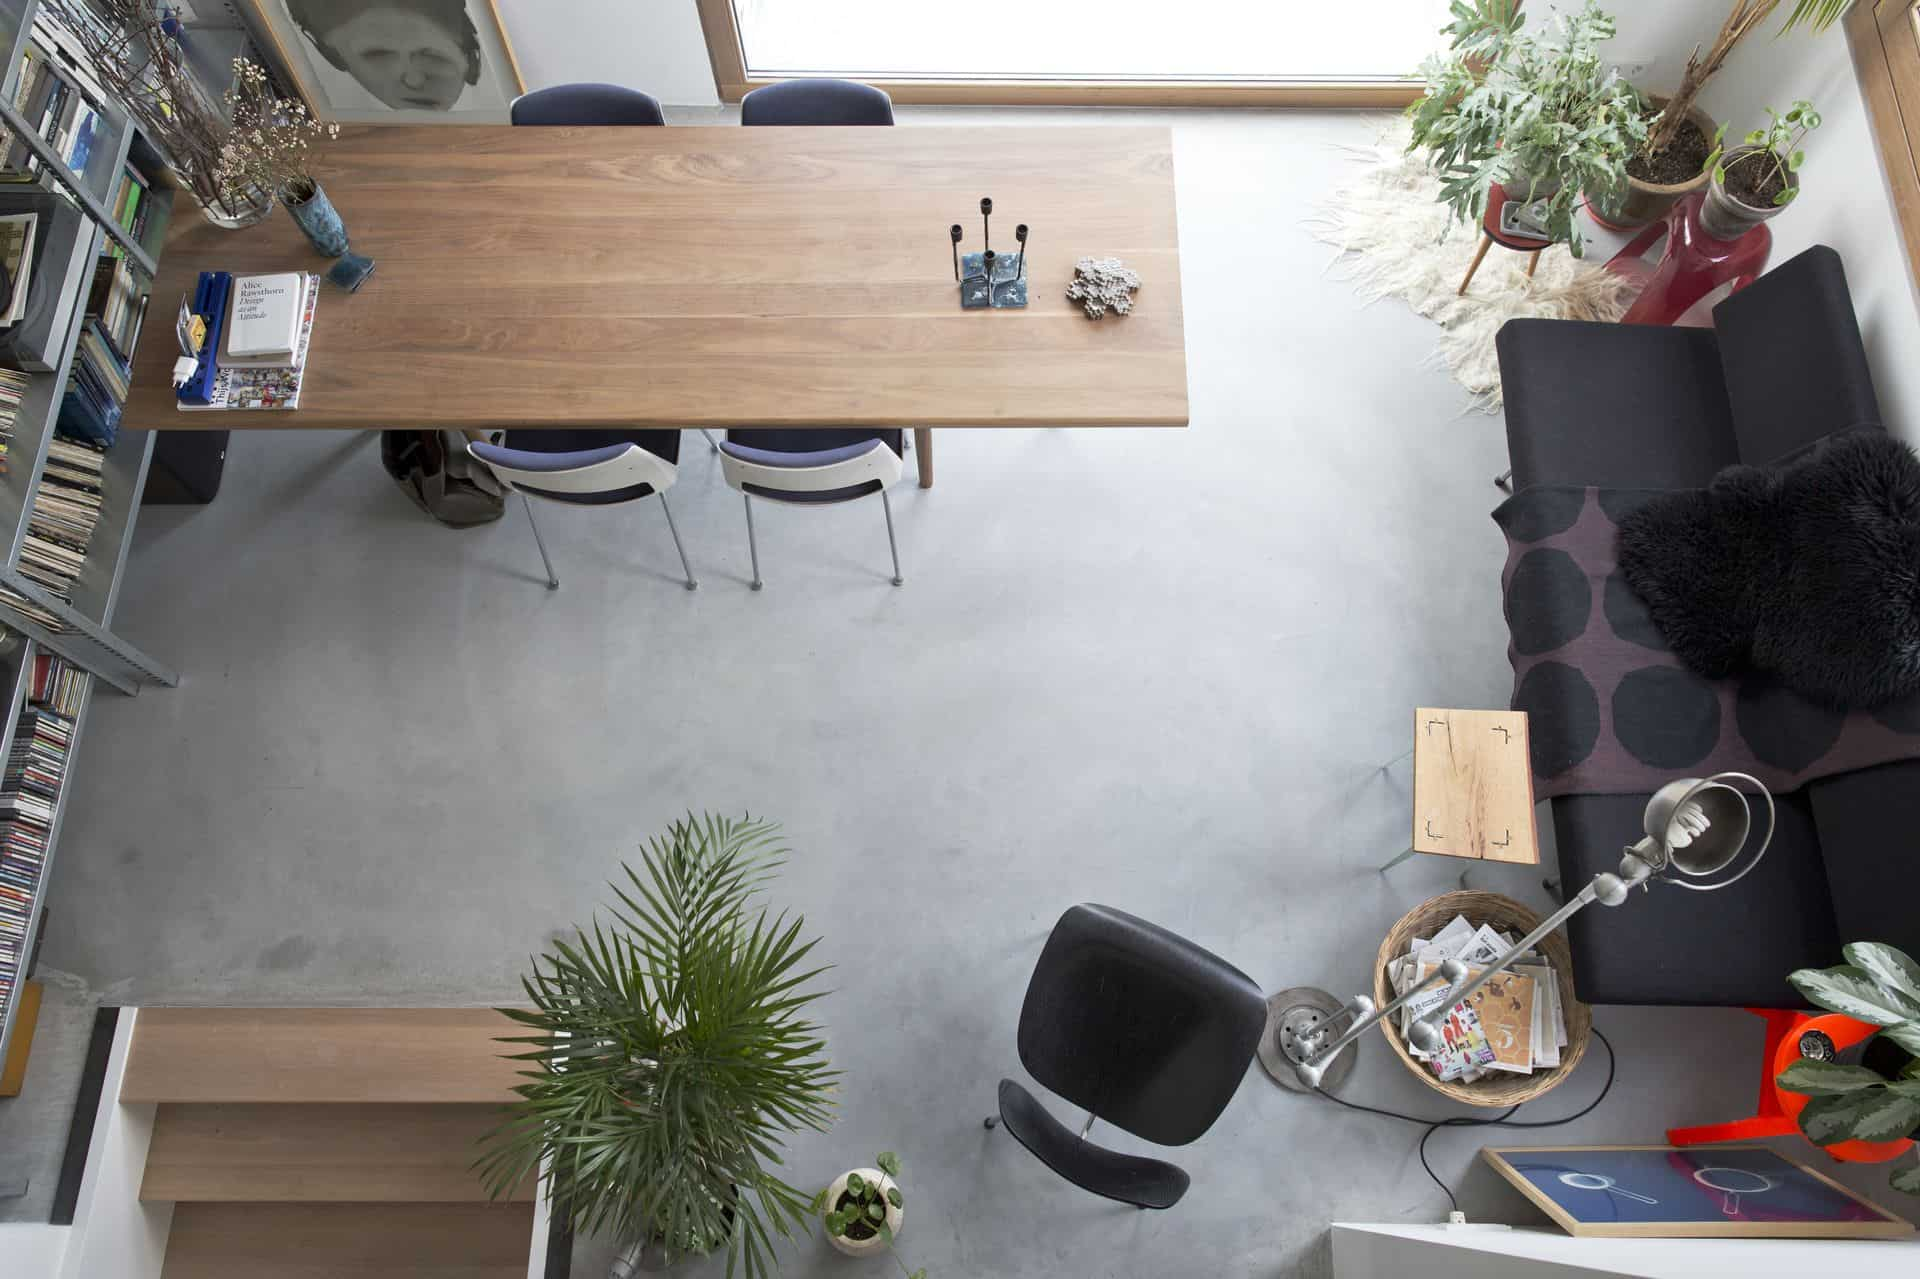 woonbeton in woning in kamer, betonnen vloer in het interieur